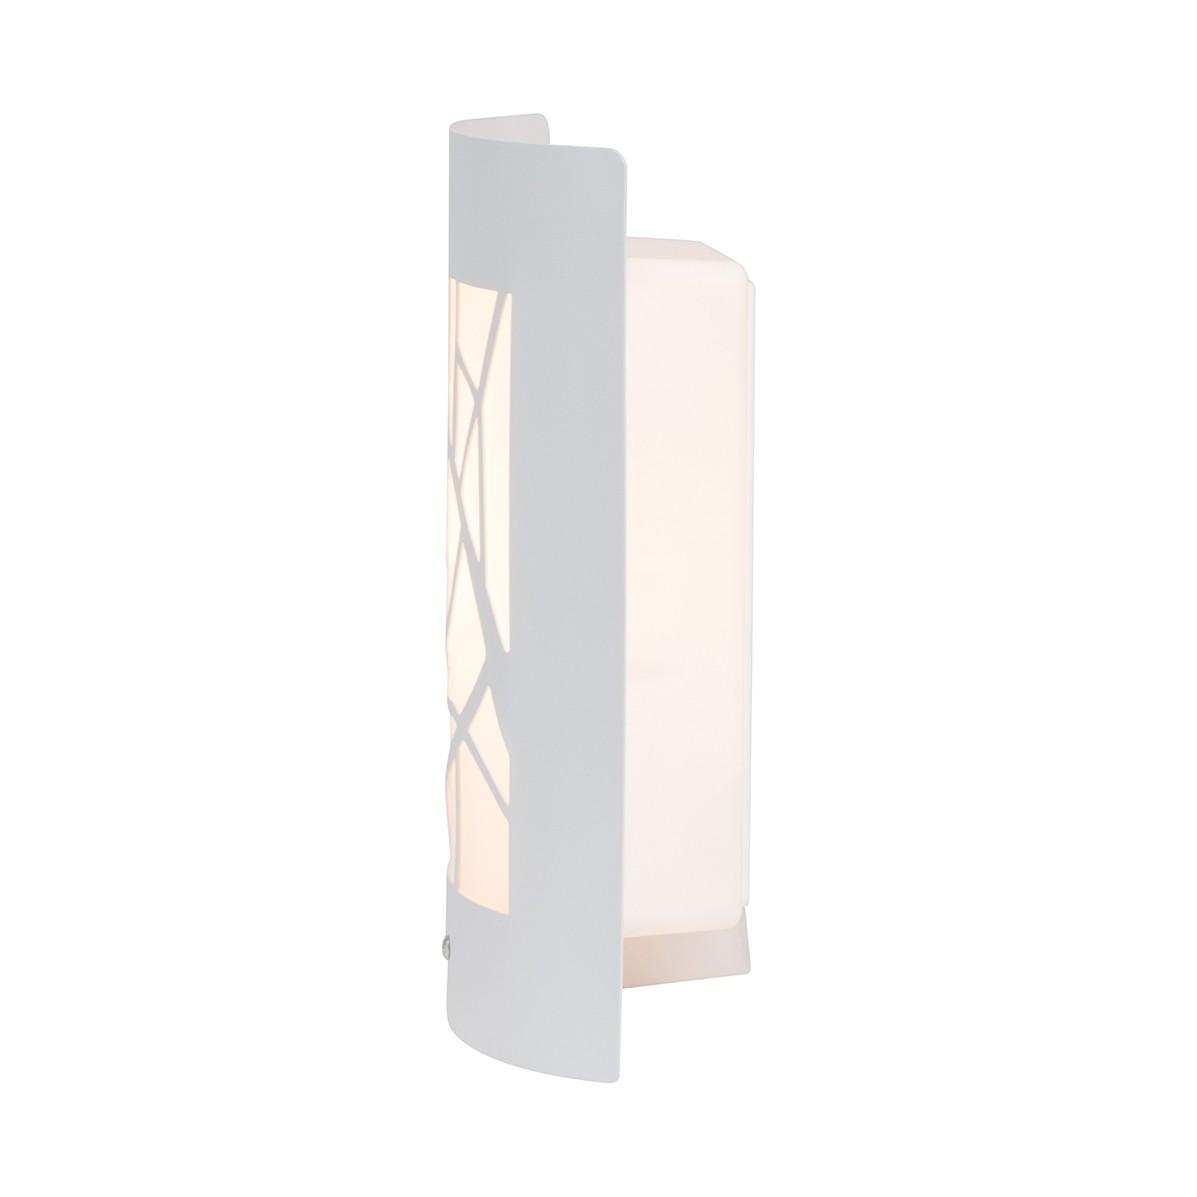 energie  A++, Buitenlamp Malo - 1 lichtbron, Brilliant